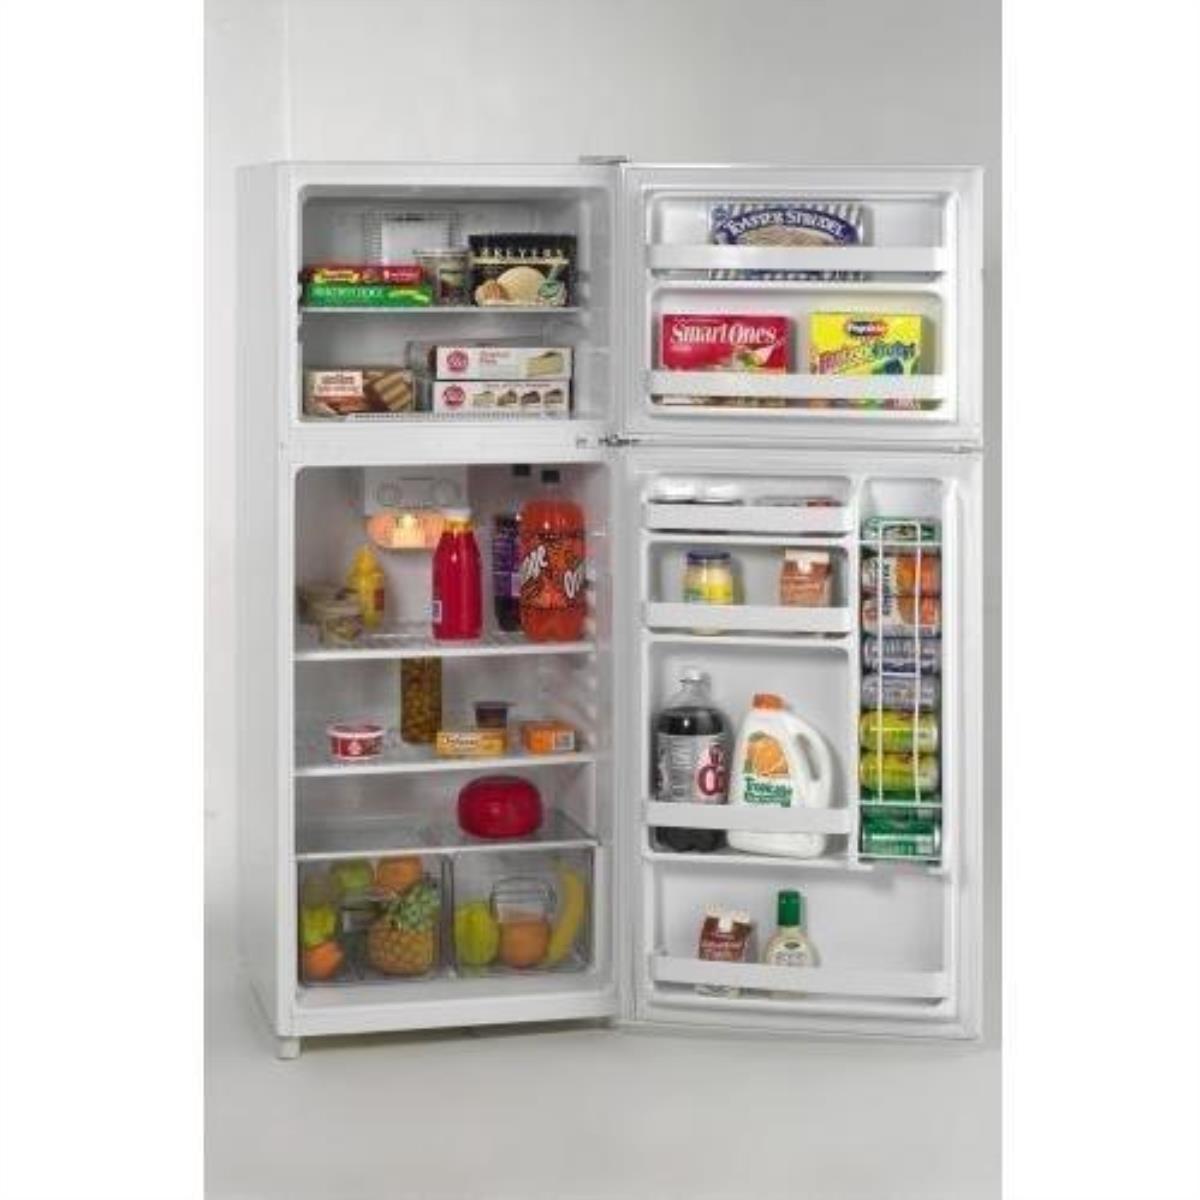 Avanti Appliances | 7.4 Cubic Foot Refrigerator | Avanti Refrigerator